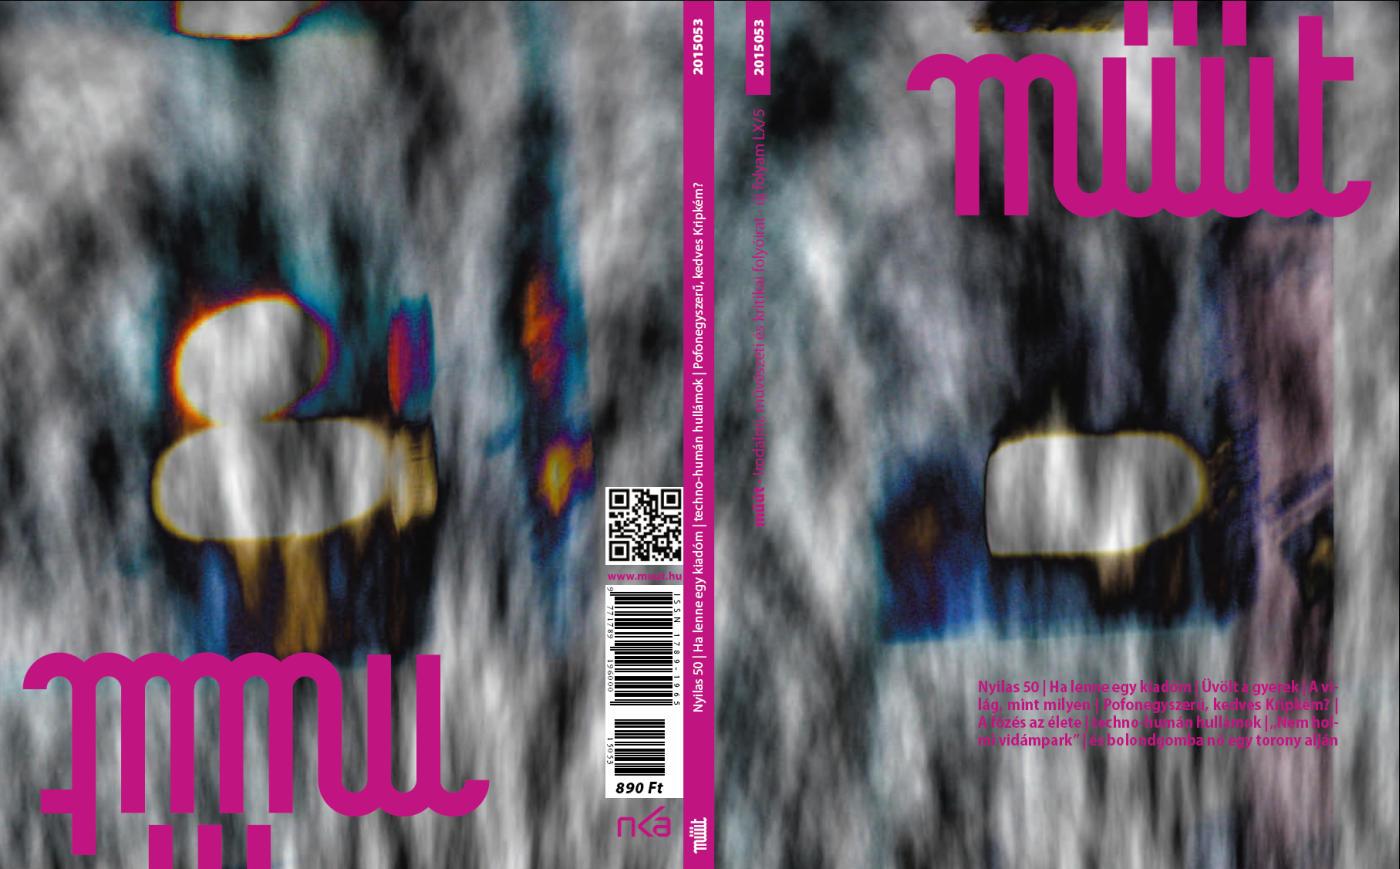 021 by Műút folyóirat issuu